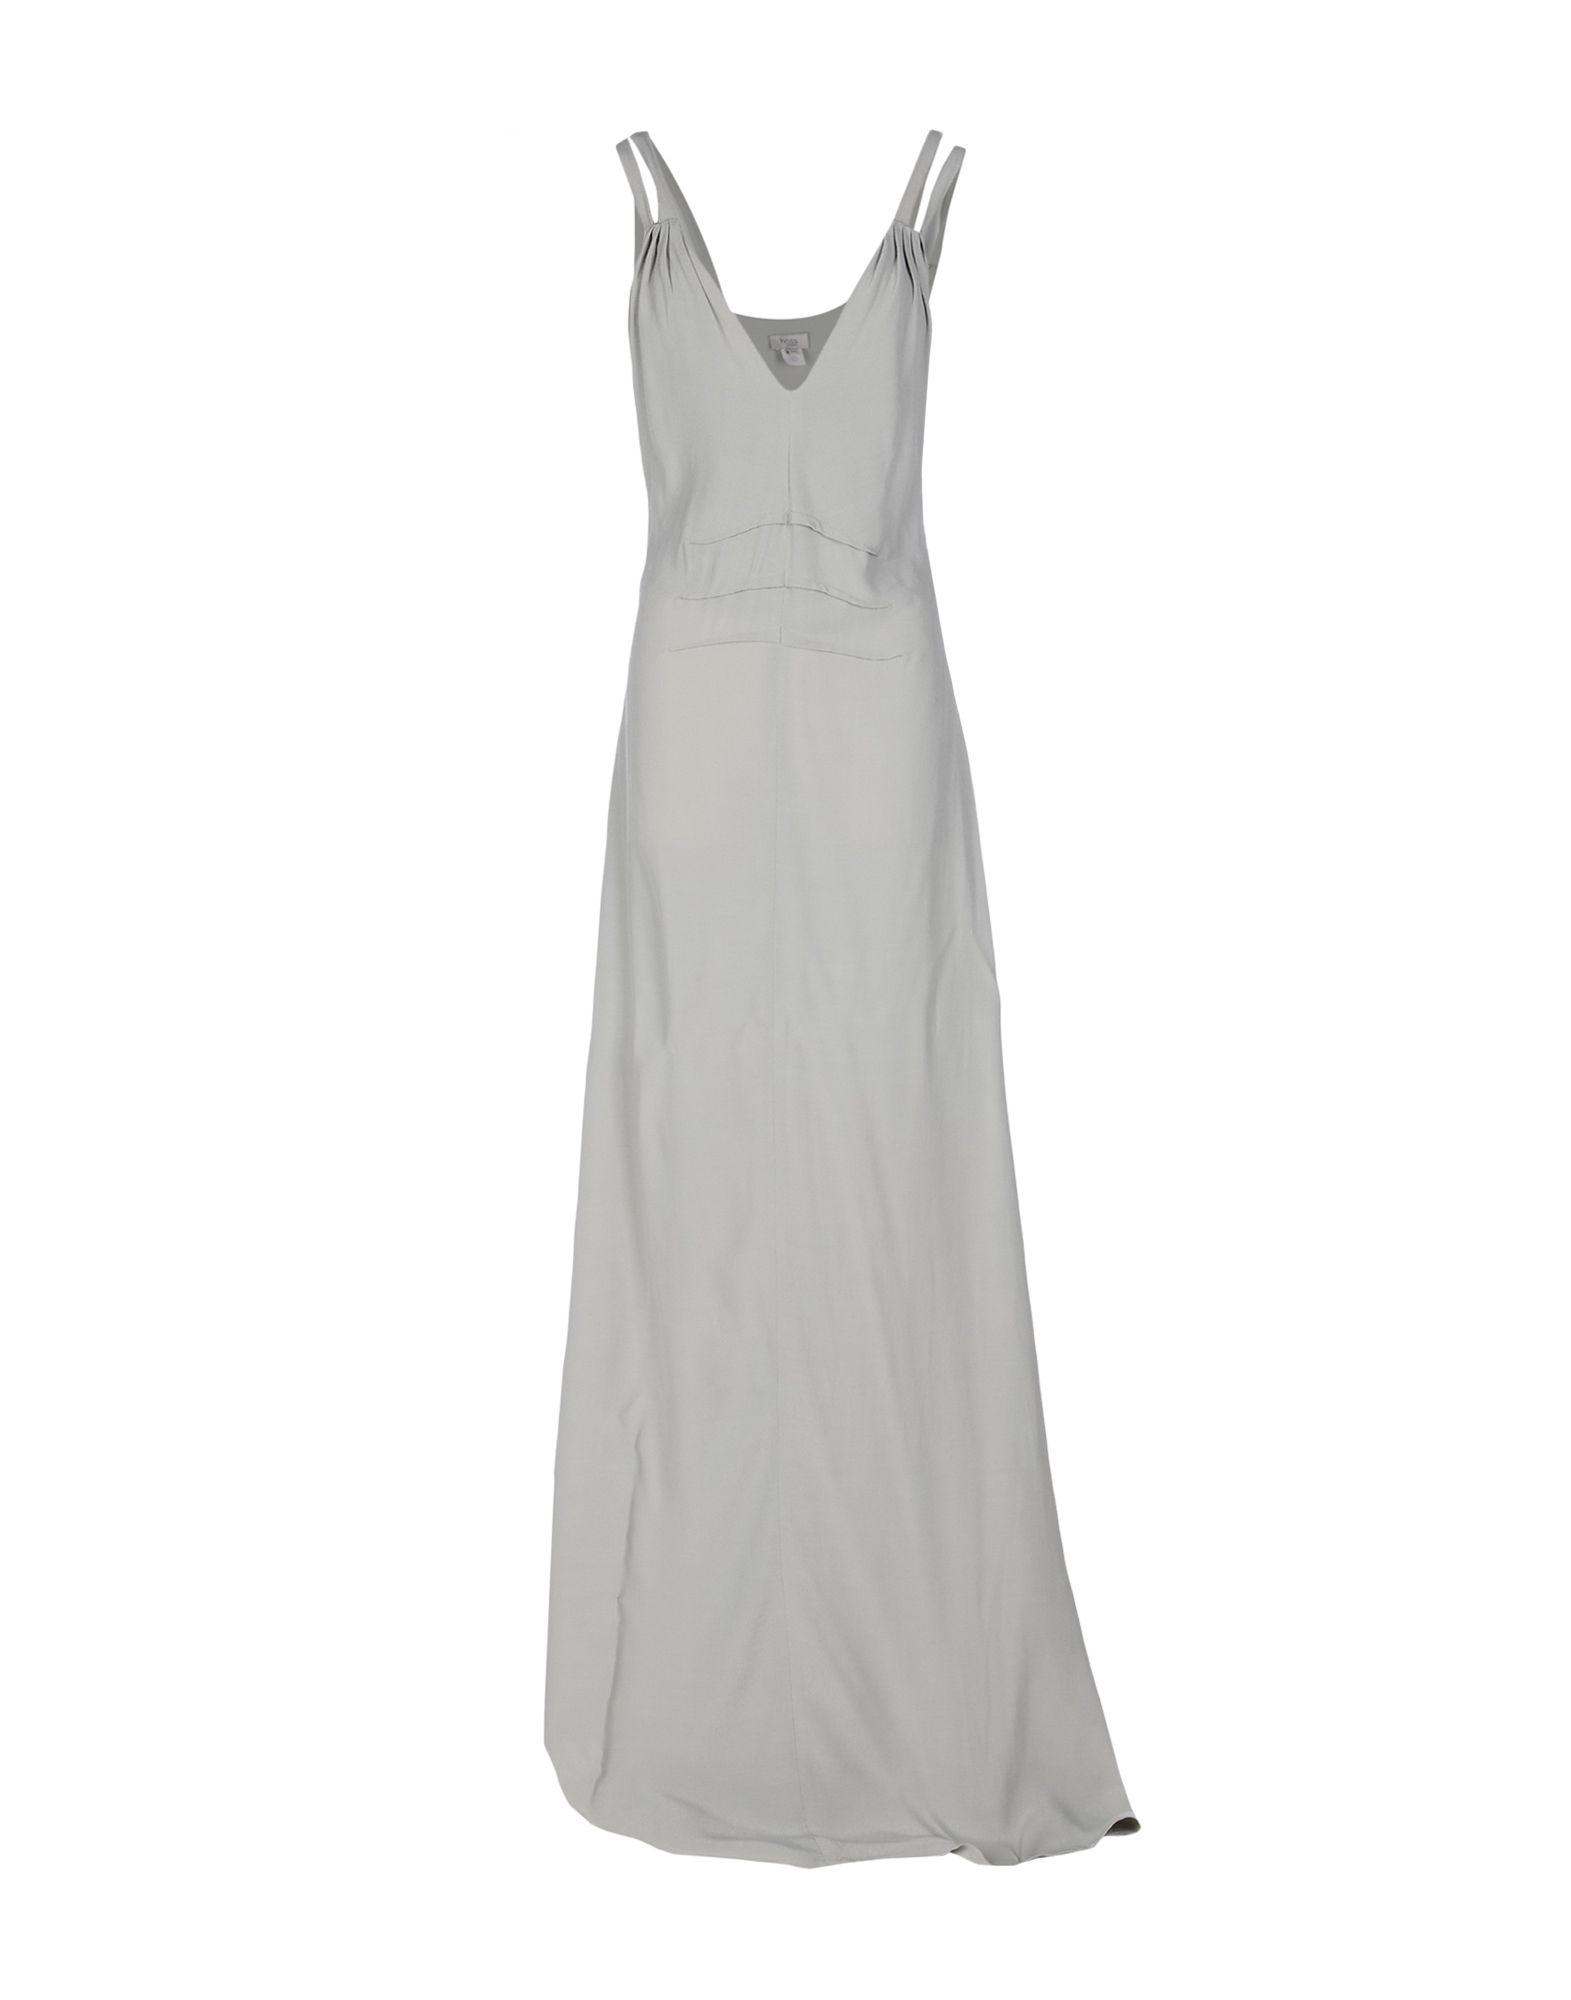 INTROPIA Длинное платье воблер rapala глубоко погружающийся длина 12 см вес 15 г dhj12 s